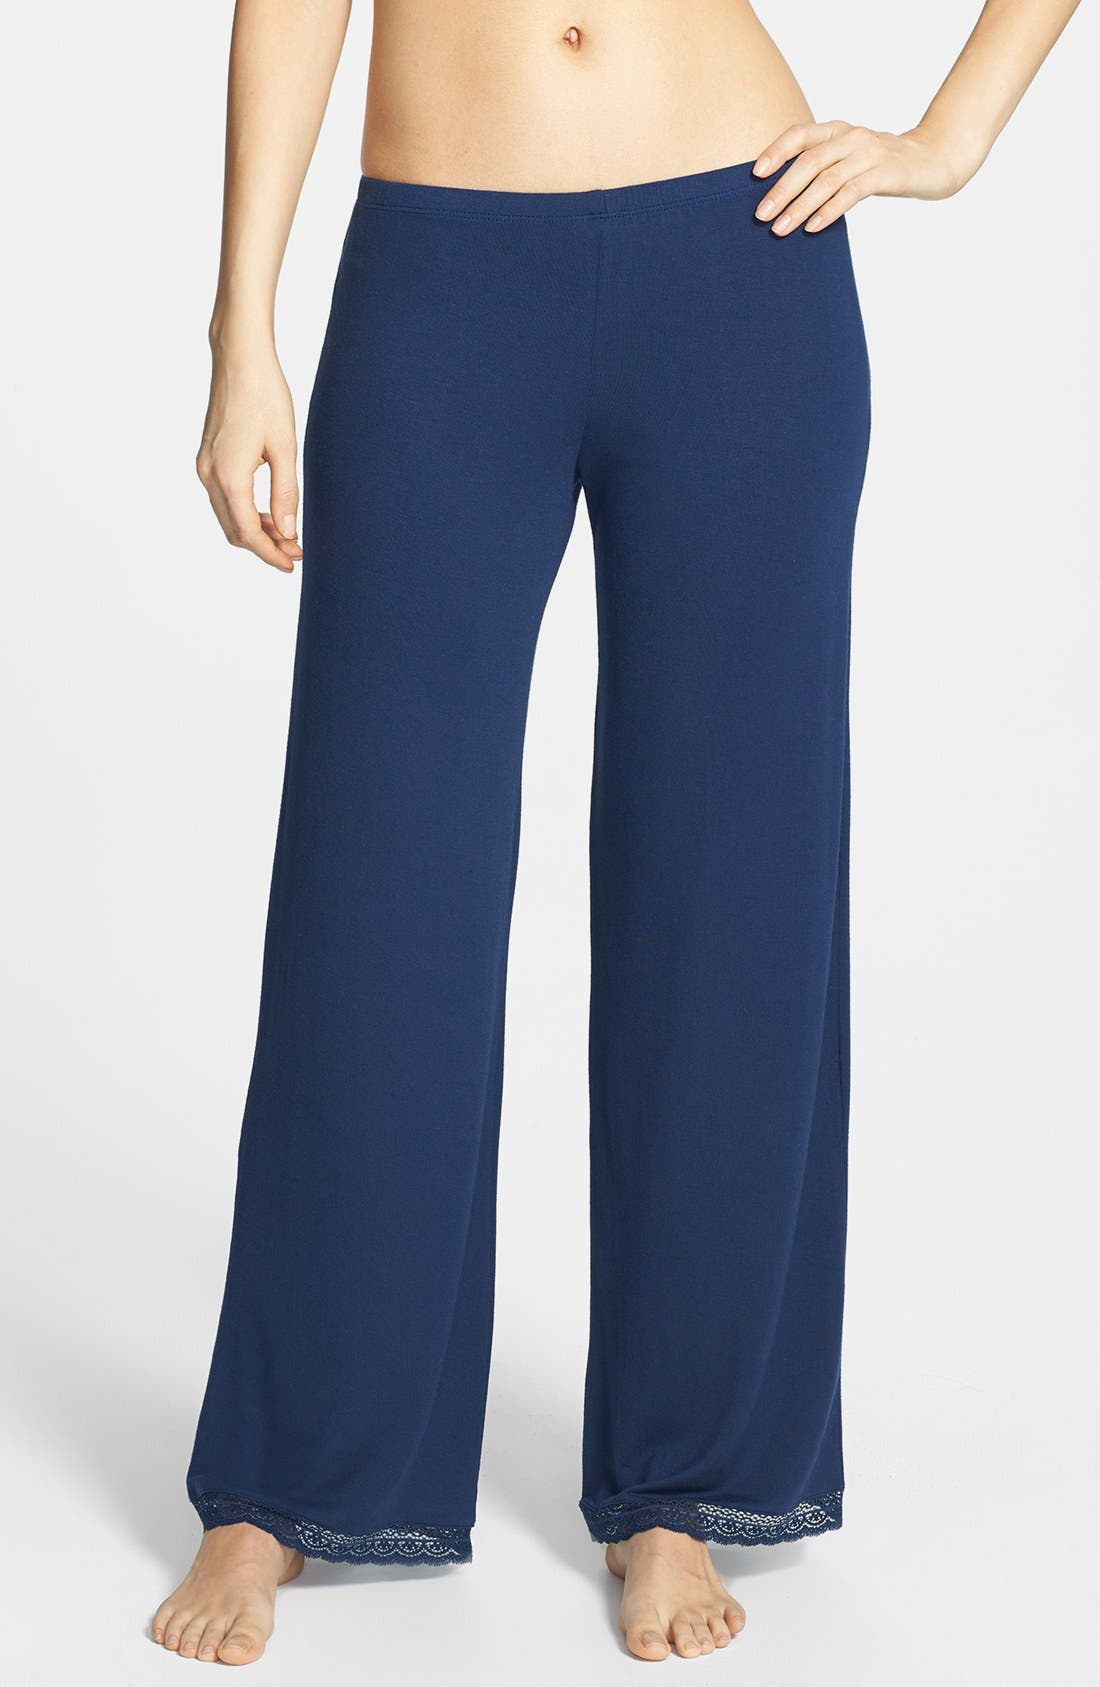 Alternate Image 1 Selected - Eberjey 'Gisele' Lace Jersey Pajama Pants